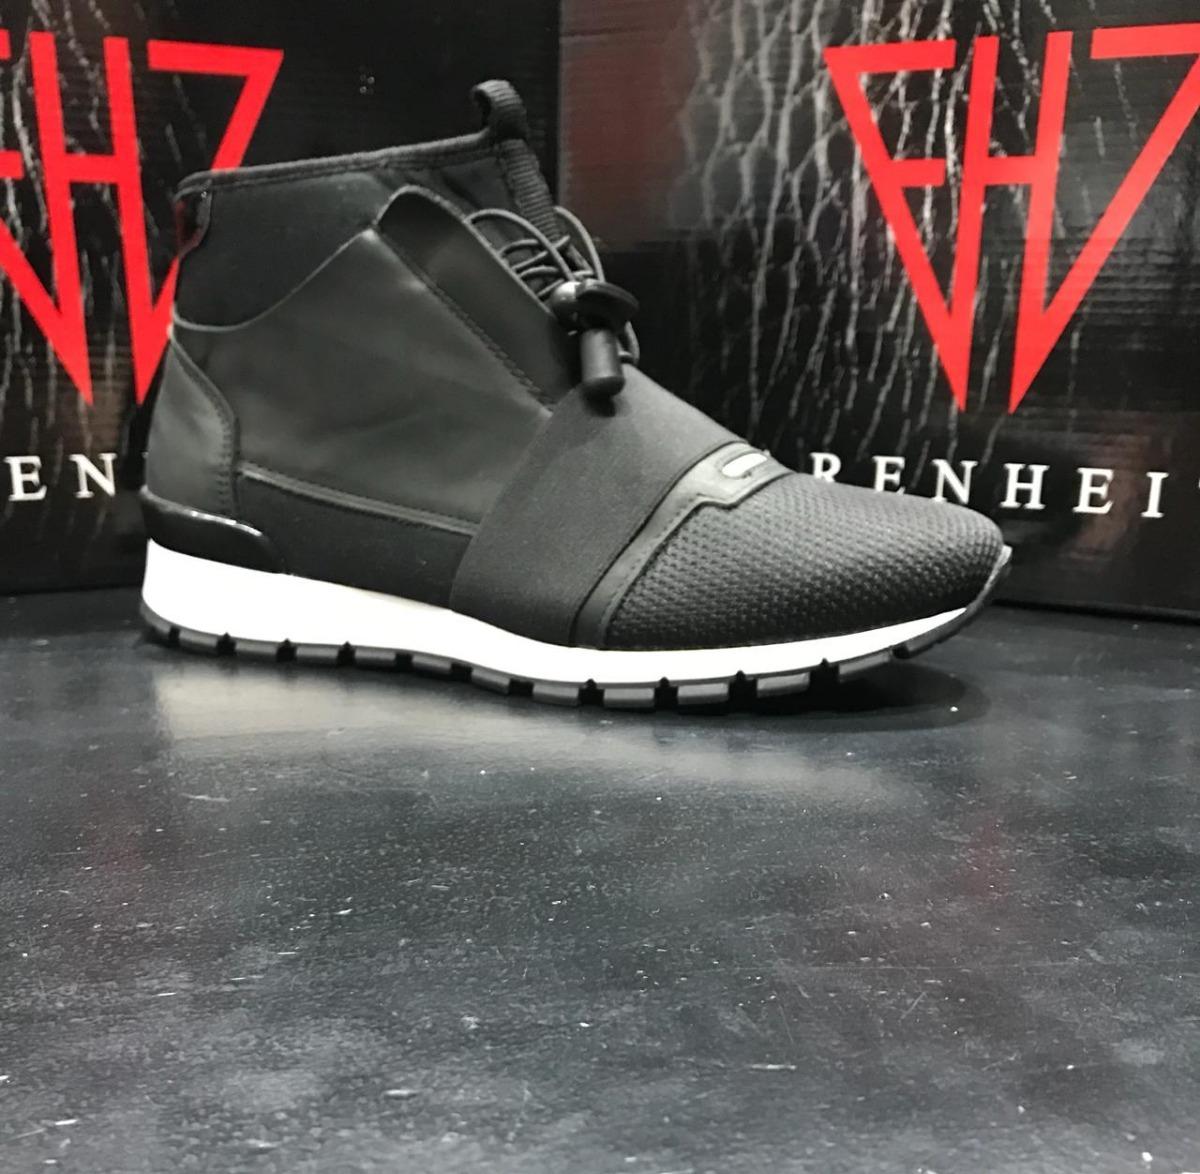 194503b304f zapatillas botitas negras con neoprene hombre farenheite. Cargando zoom.